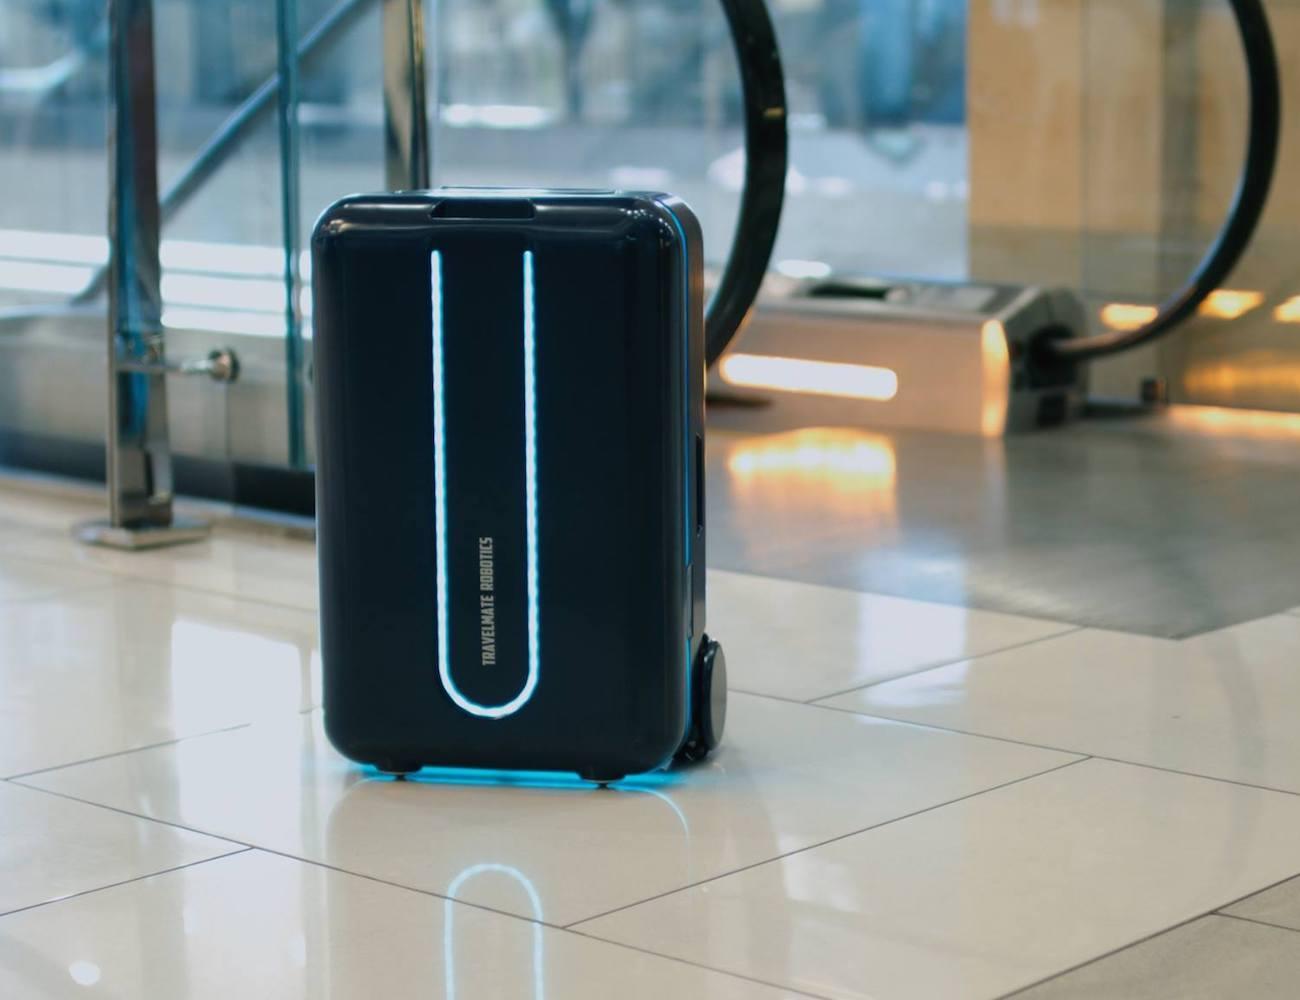 Travelmate Robot Suitcase Review » The Gadget Flow